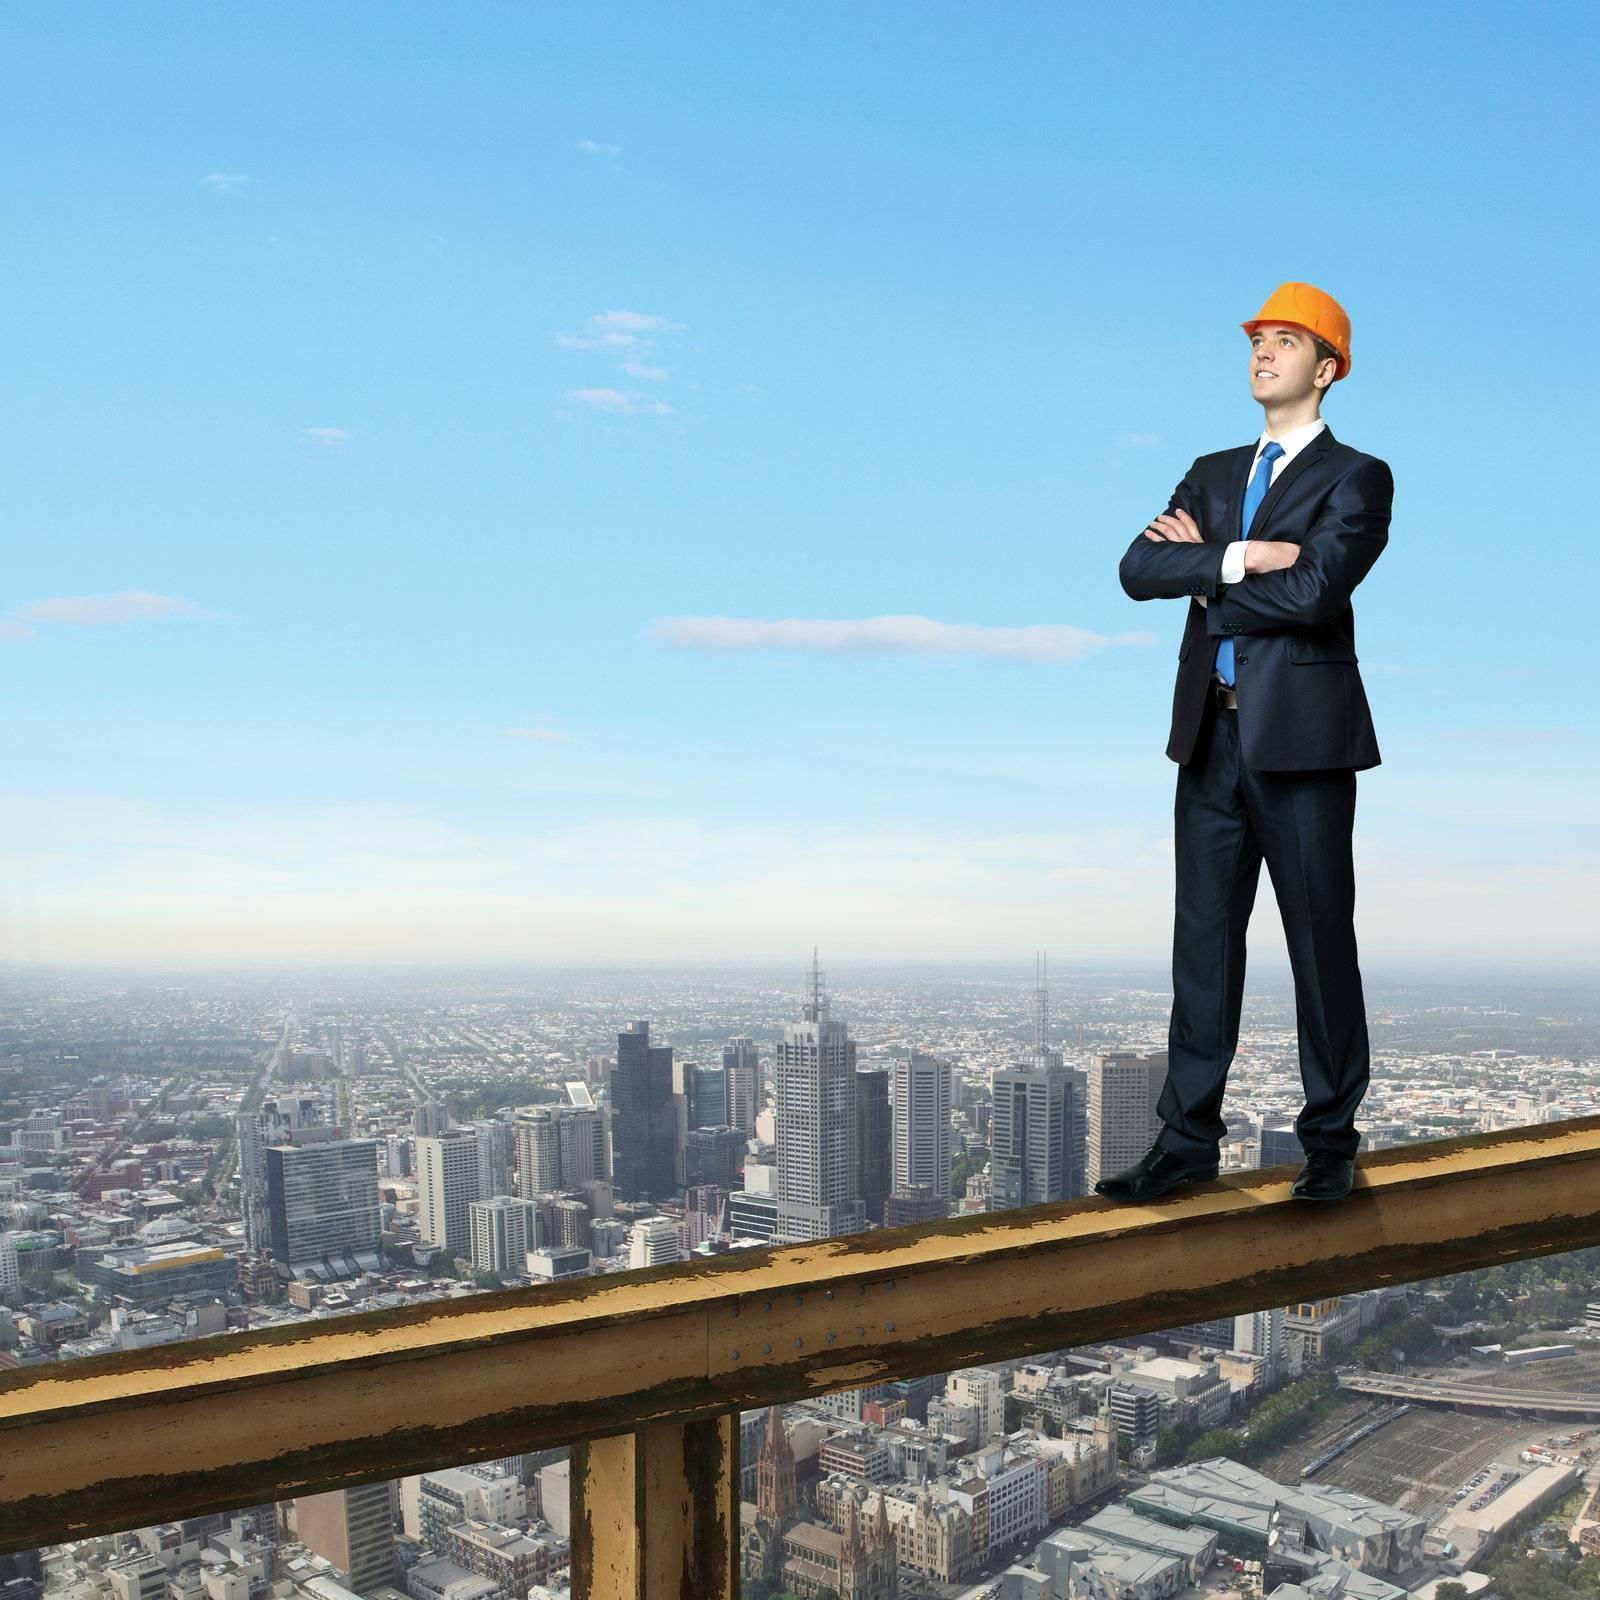 construction, industry, business, architect, helmet, supervisor - D6542716